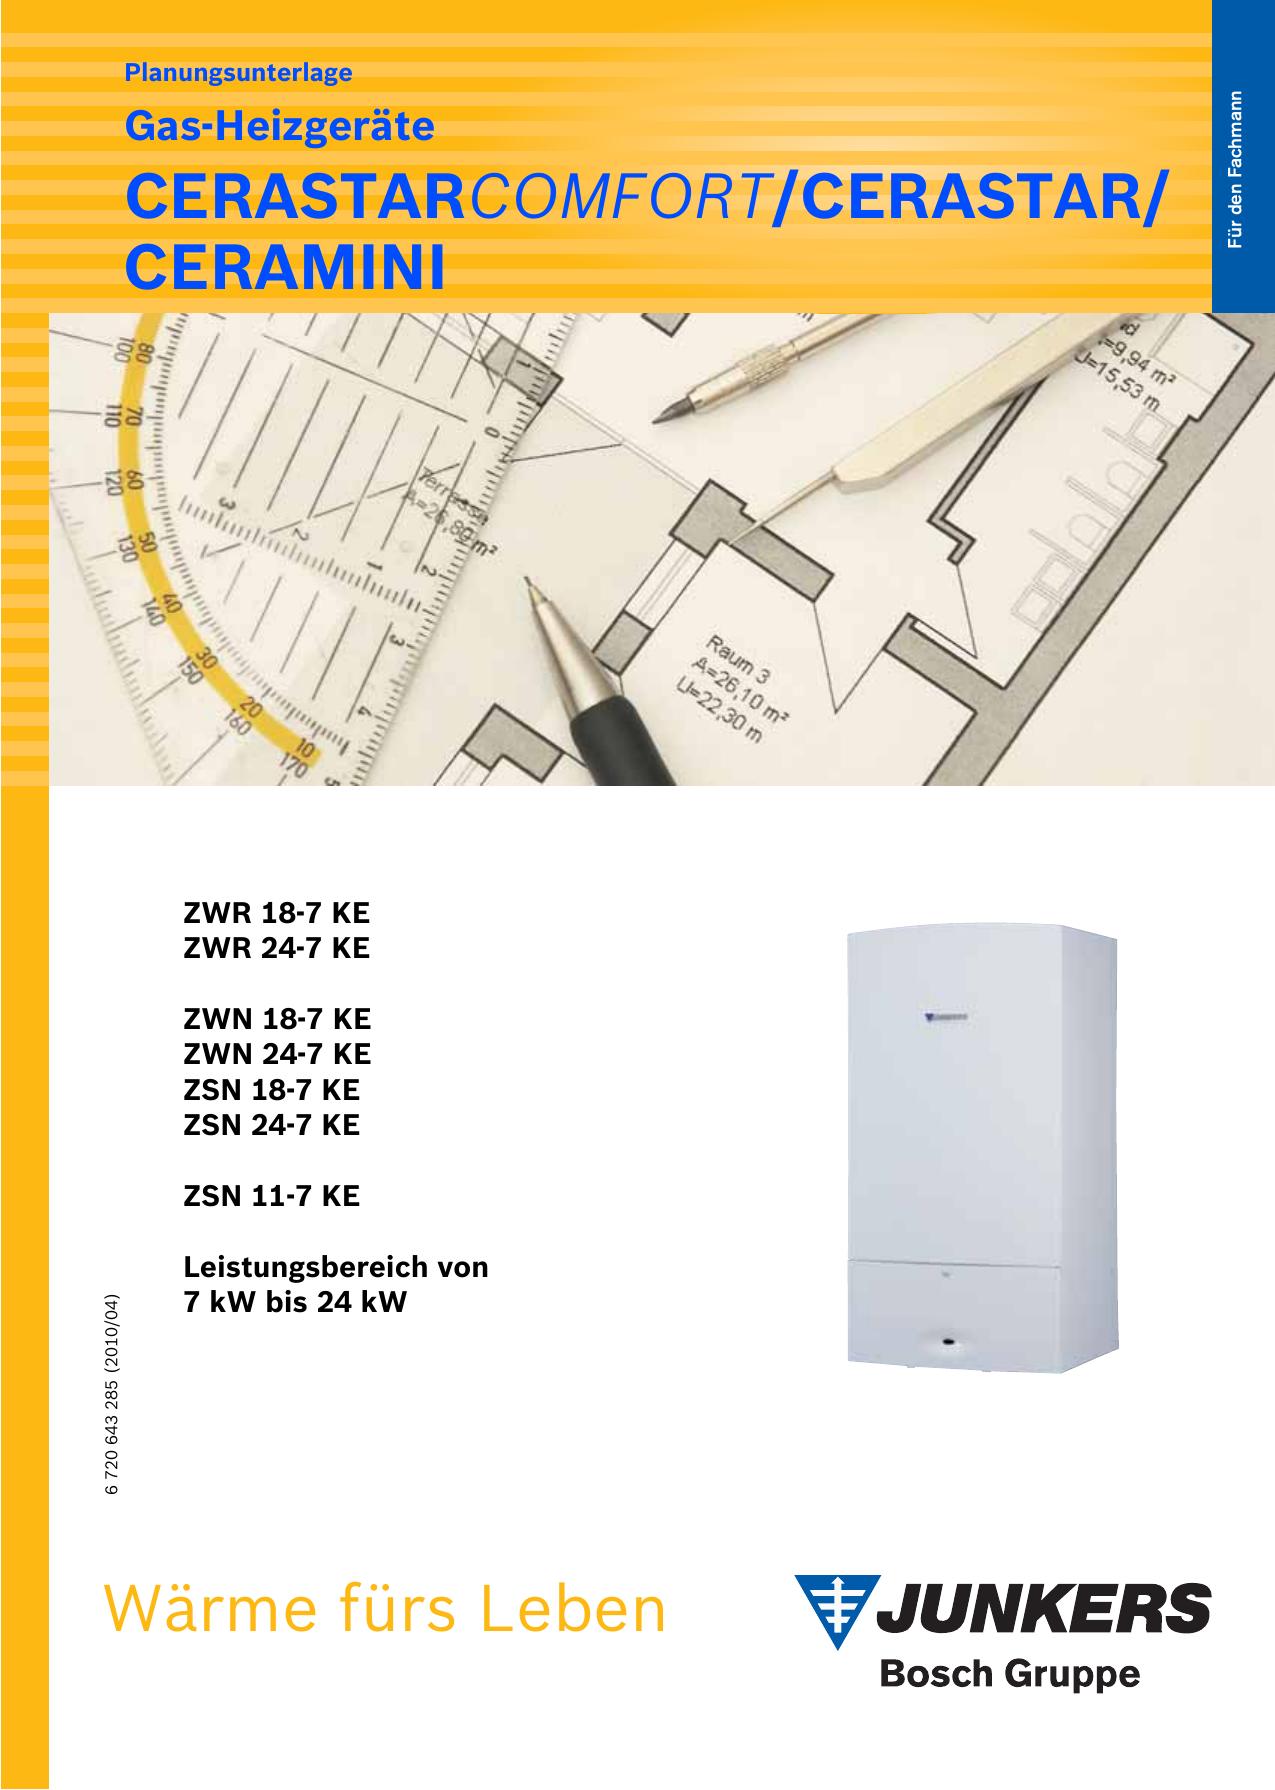 Unterlagen zur Planung - ImmoTec-Shop   manualzz.com